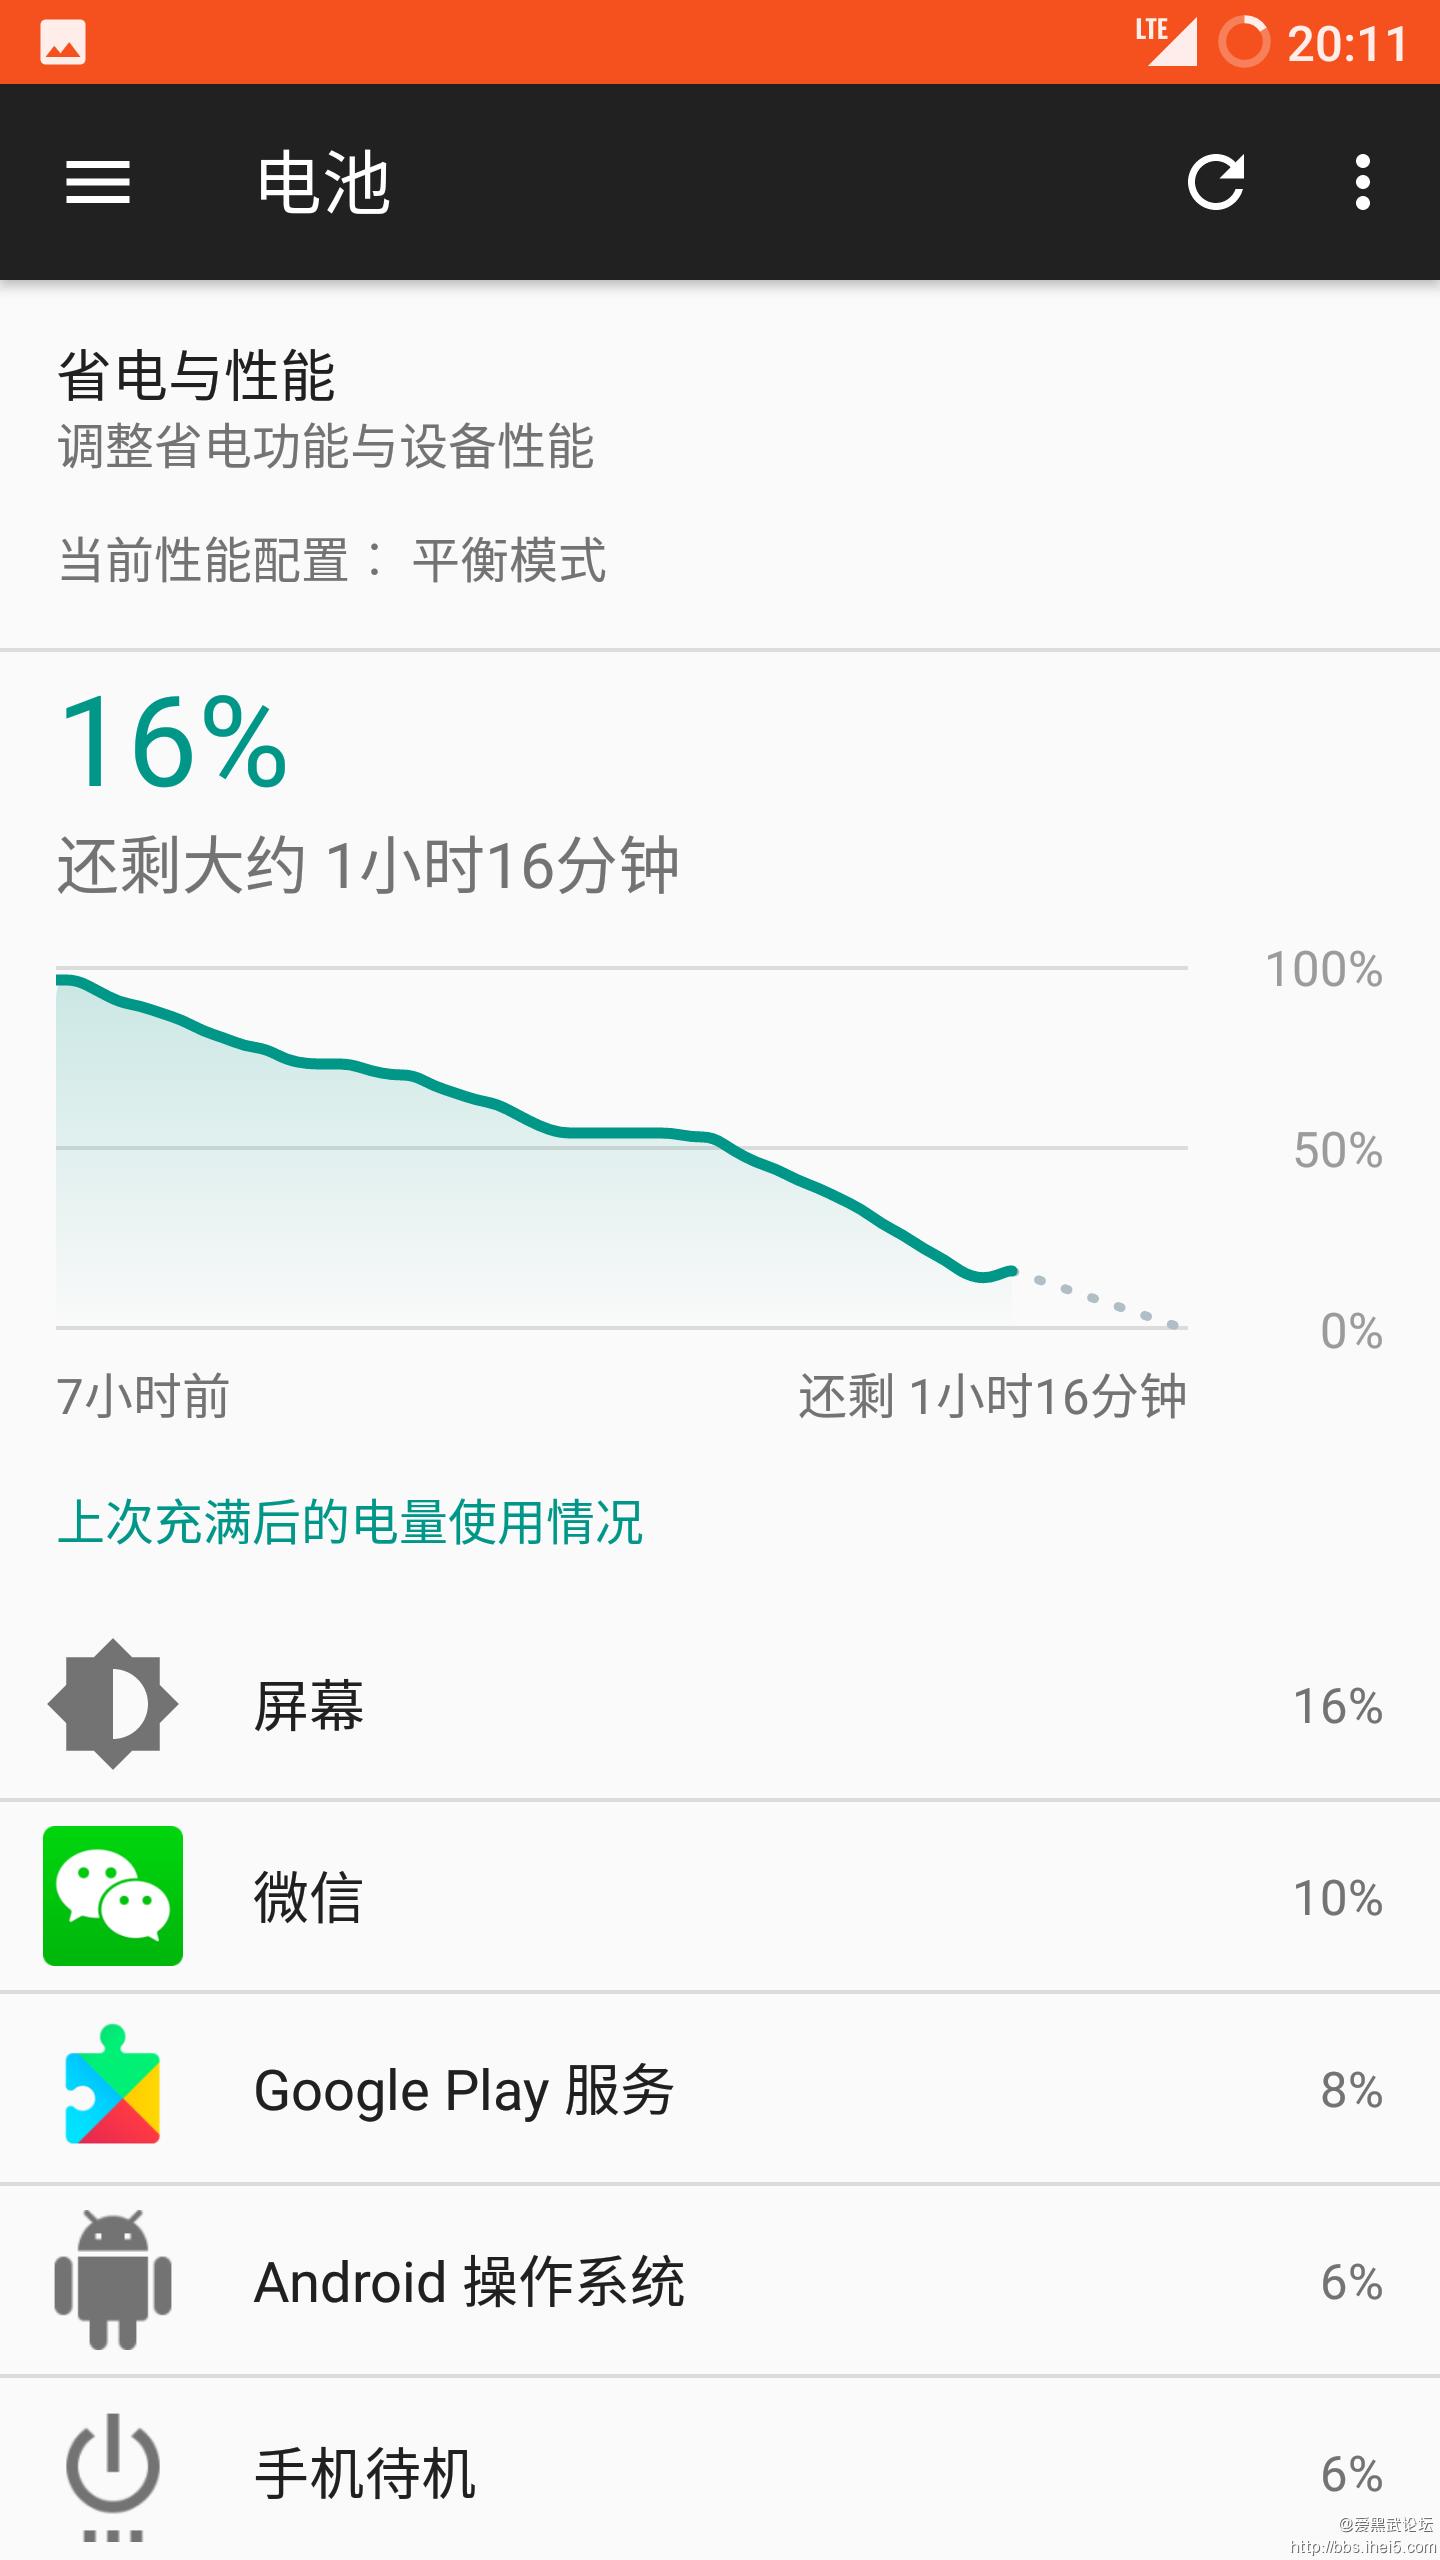 Screenshot_20170202-201153.png